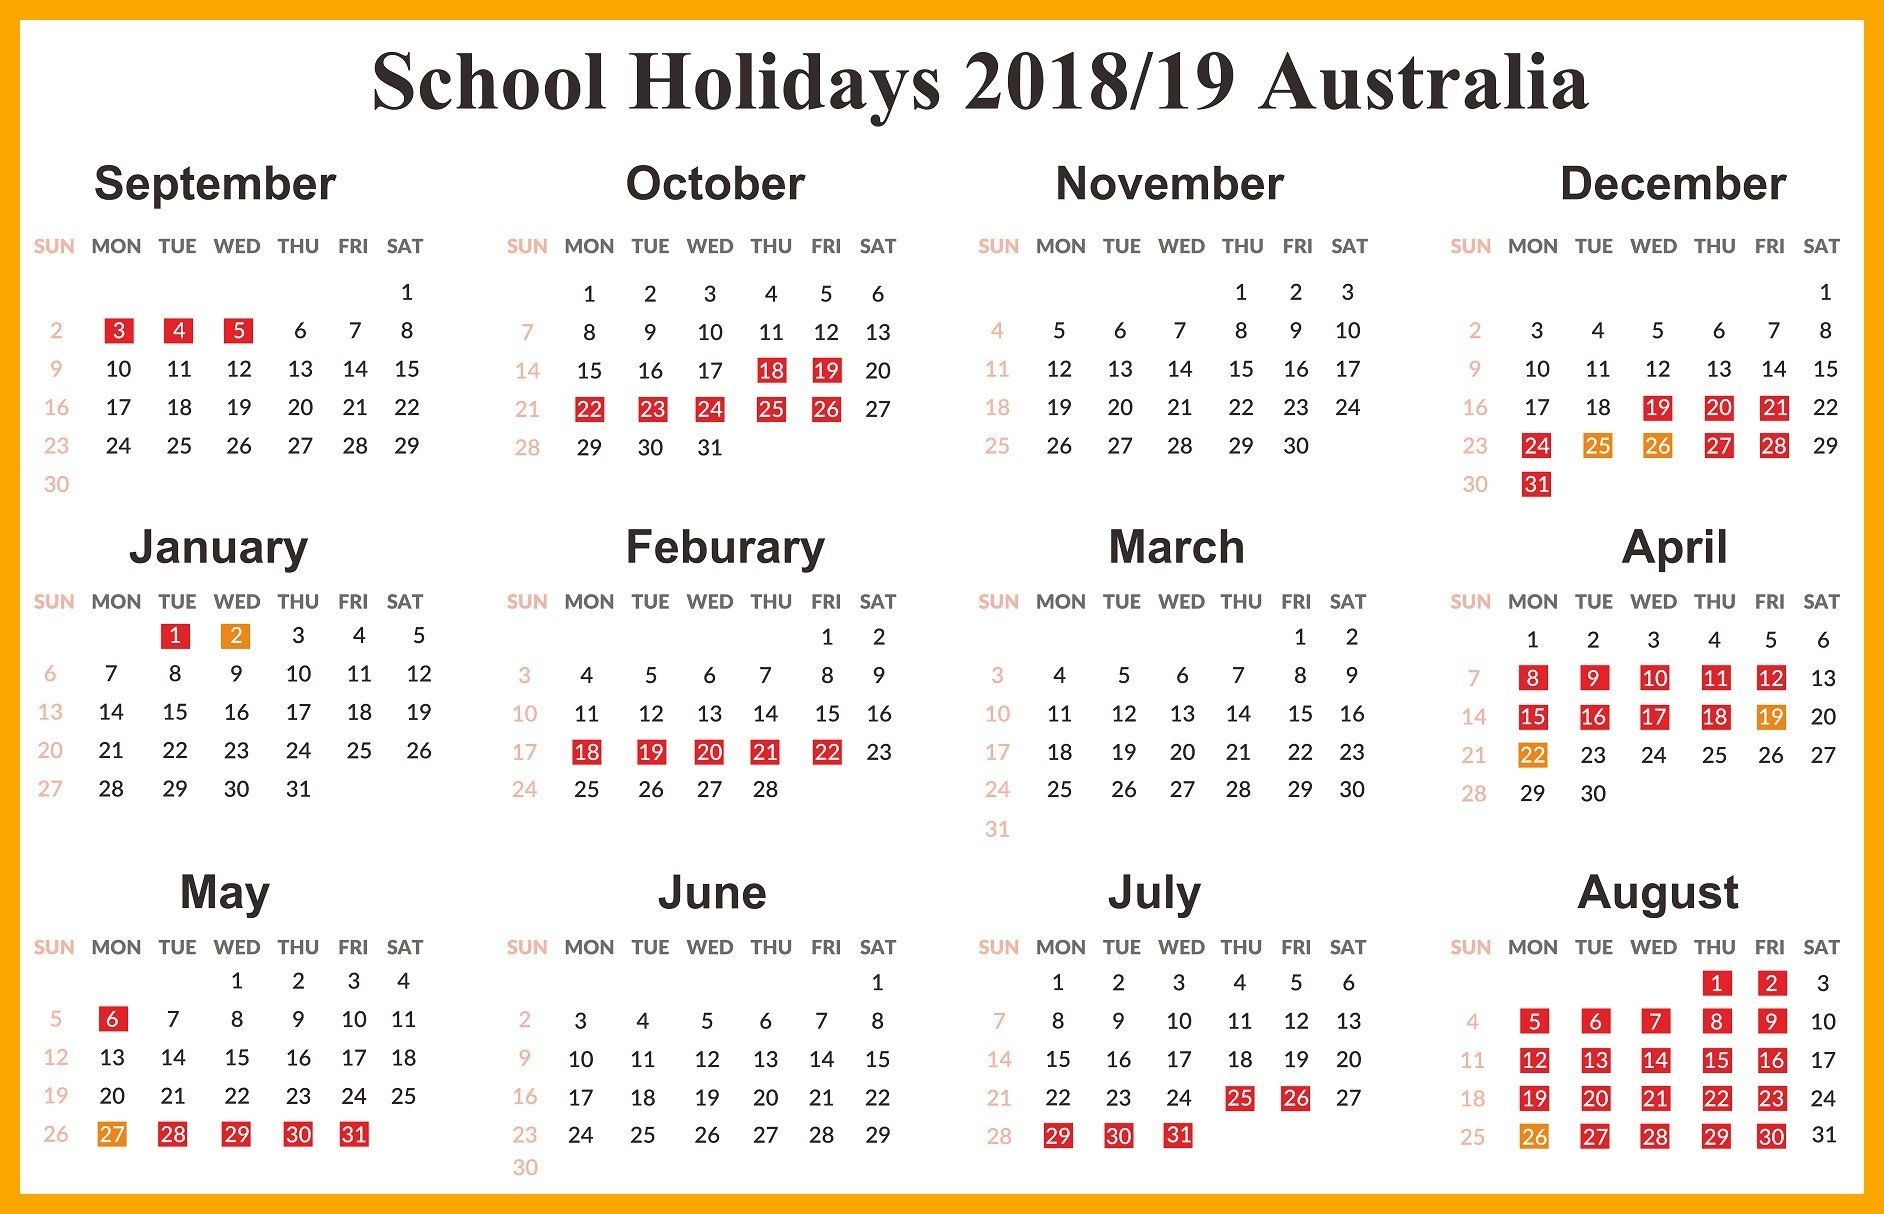 Australia 2019 School Holidays Calendar | School Holiday Printable Monthly Calendar 2020 Australia With School Holidays